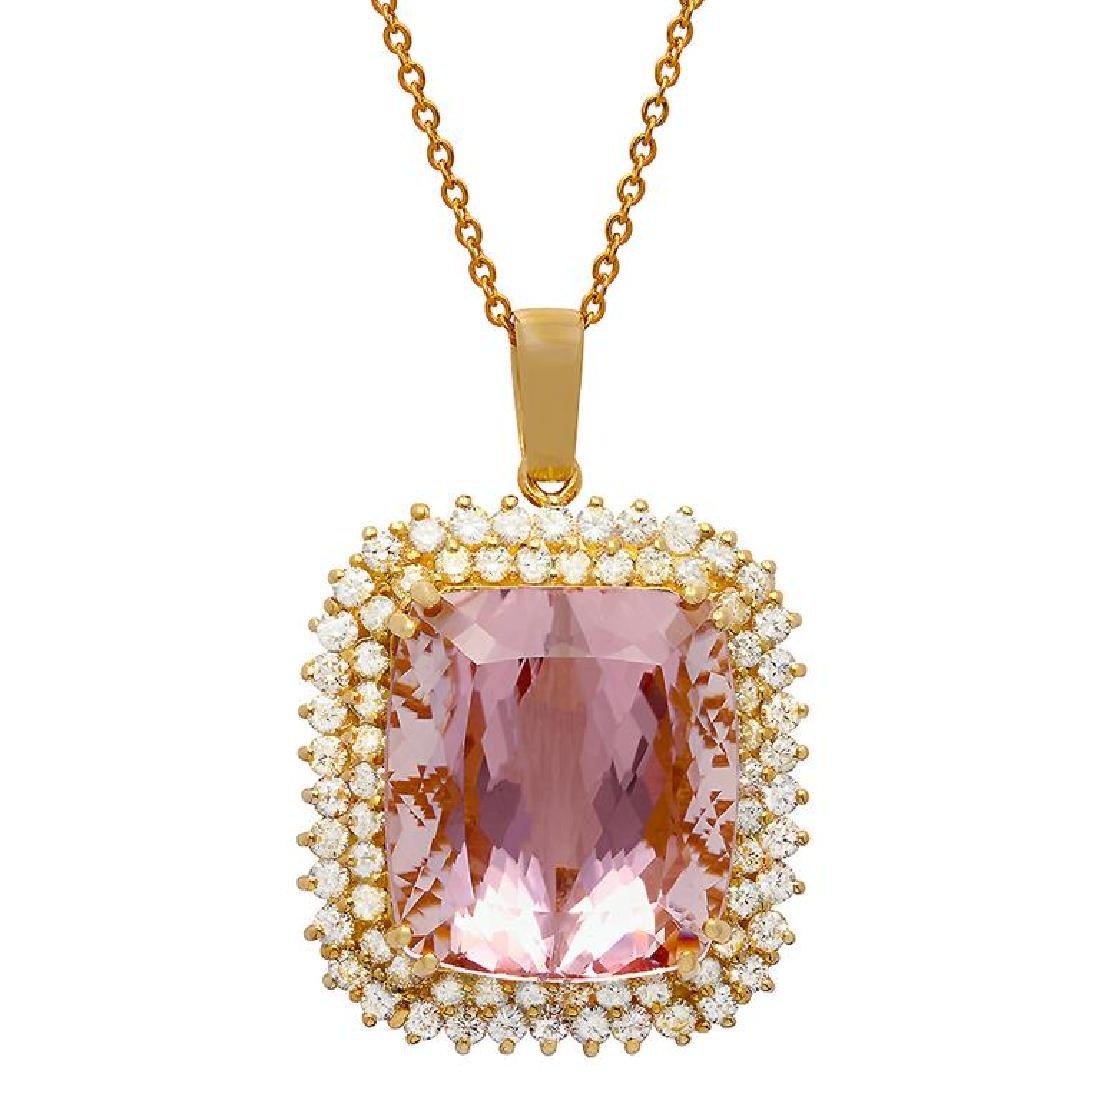 14k Yellow Gold 48.74ct Kunzite 3.03ct Diamond Pendant